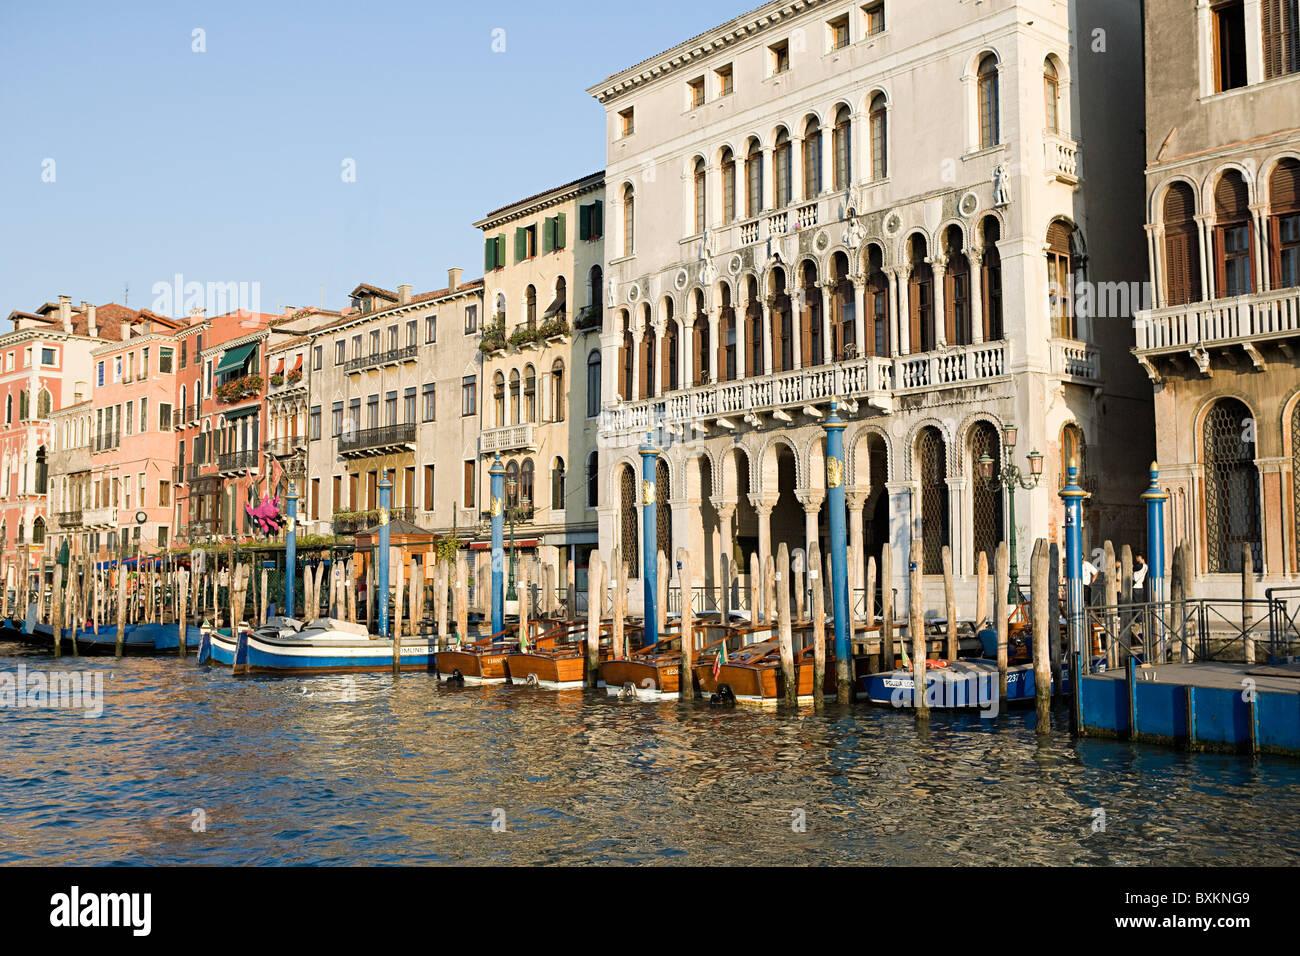 Grand canal, Venise, Italie Photo Stock